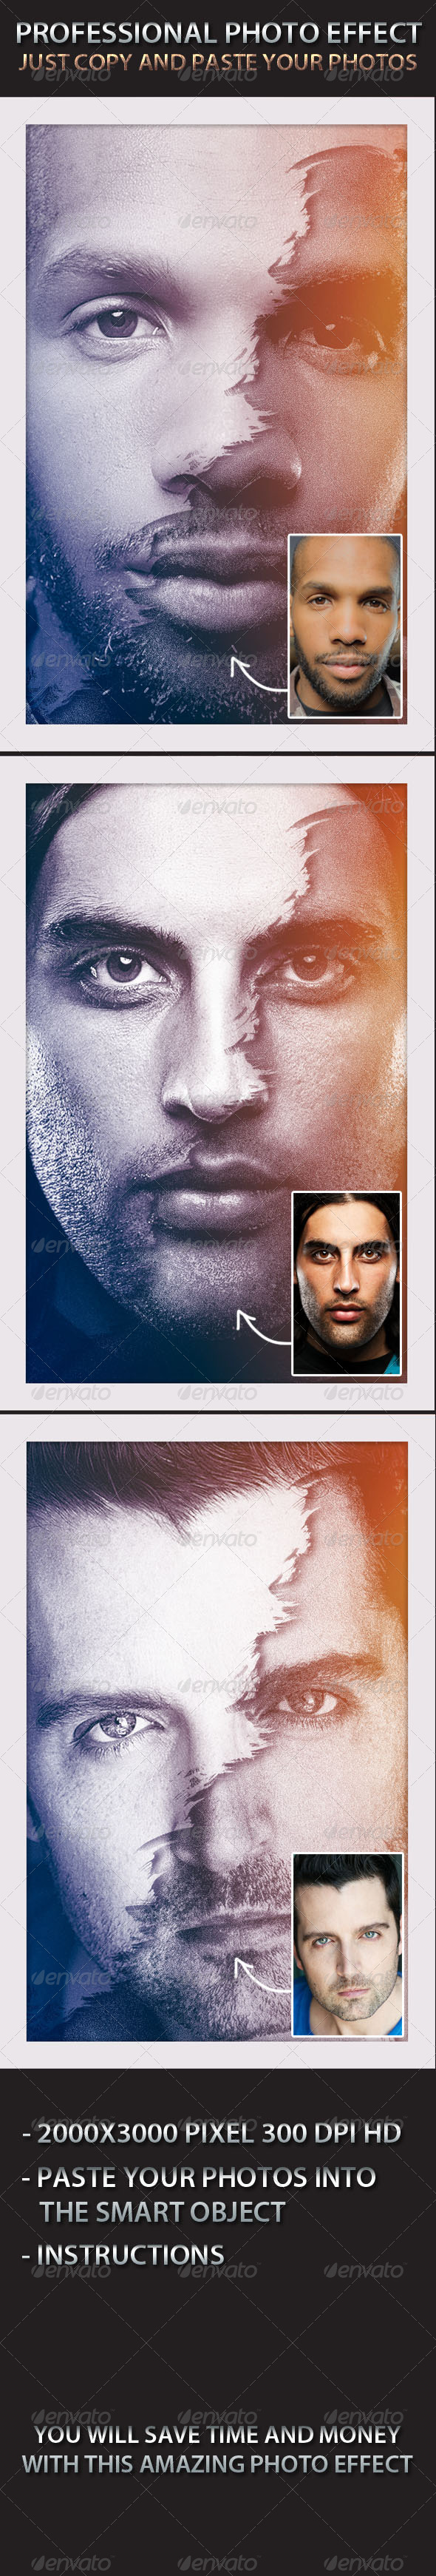 Photo Effect - Photo Template - Artistic Photo Templates